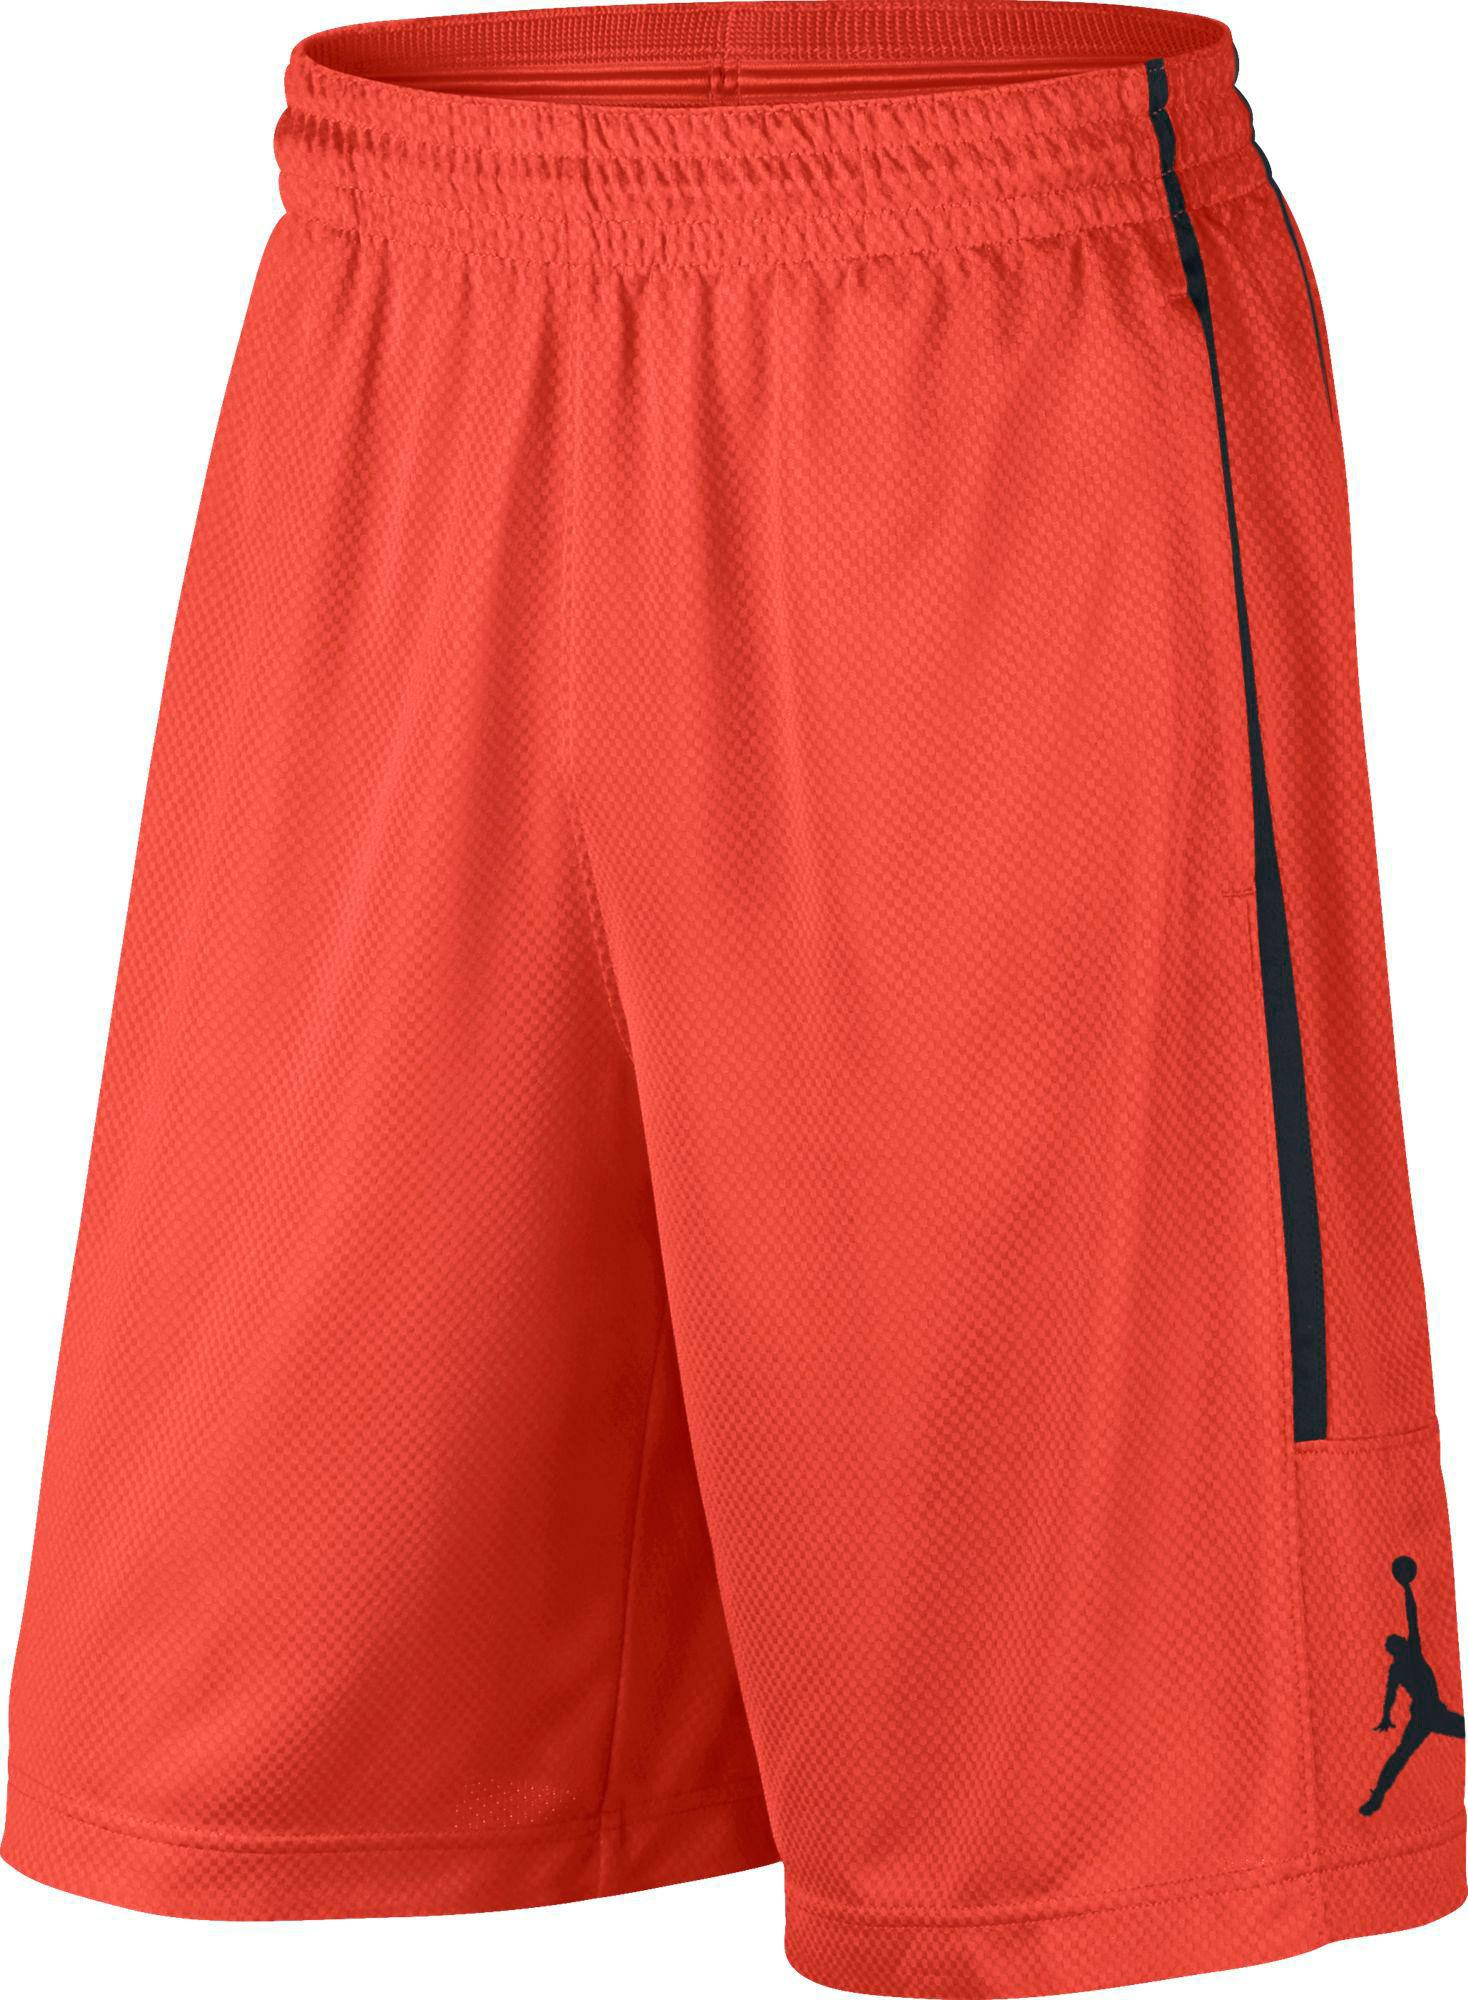 fa9daef84feb Lyst - Nike Jordan Double Crossover Basketball Shorts in Orange for Men